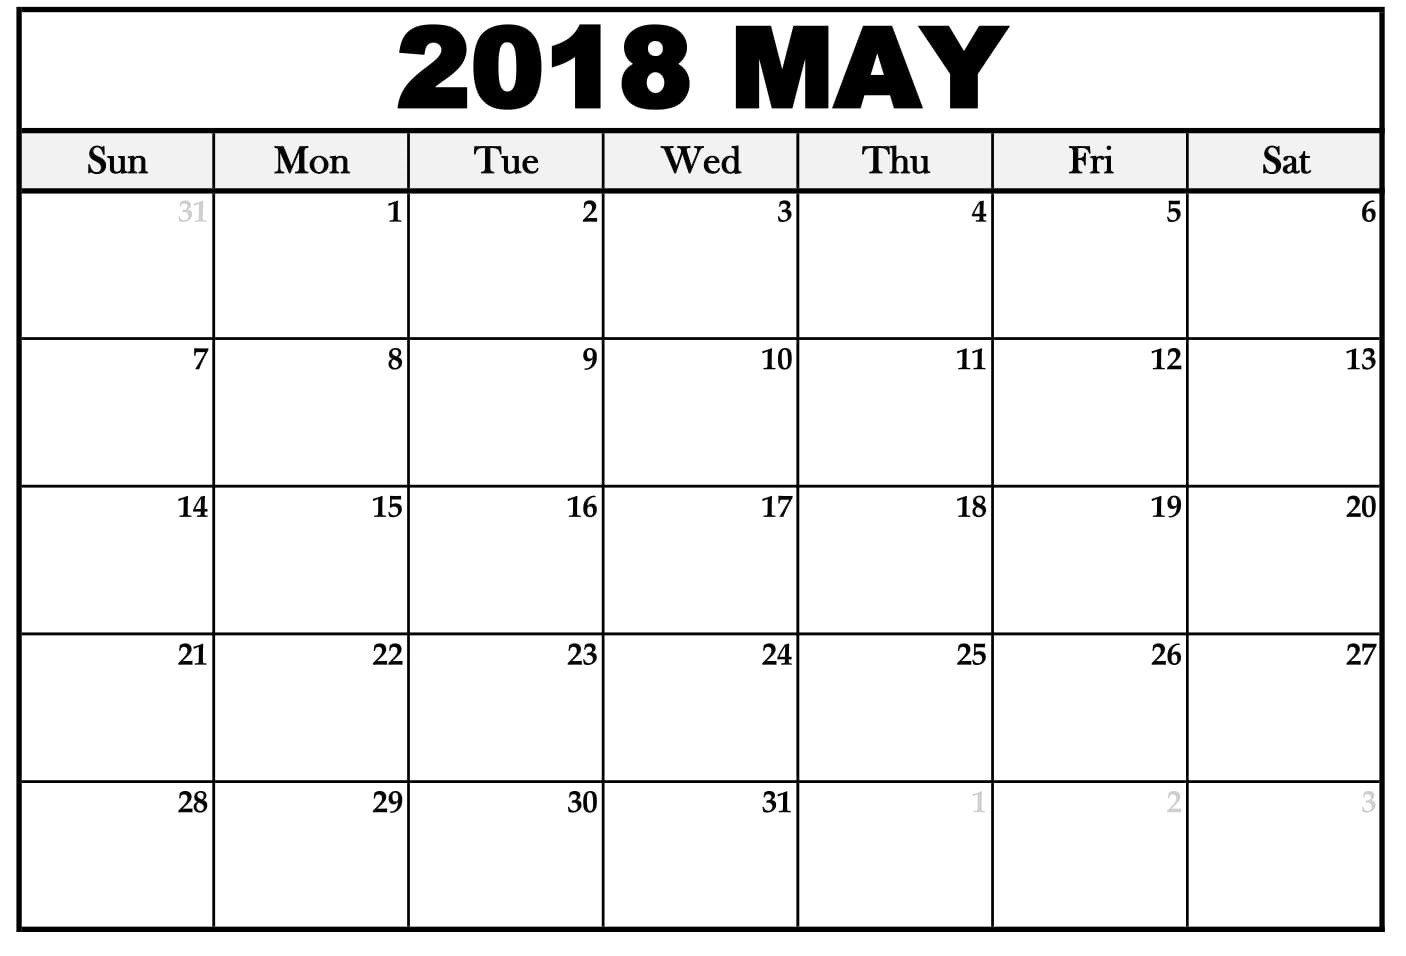 Free 5 May 2018 Calendar Printable Template Pdf August Calendar